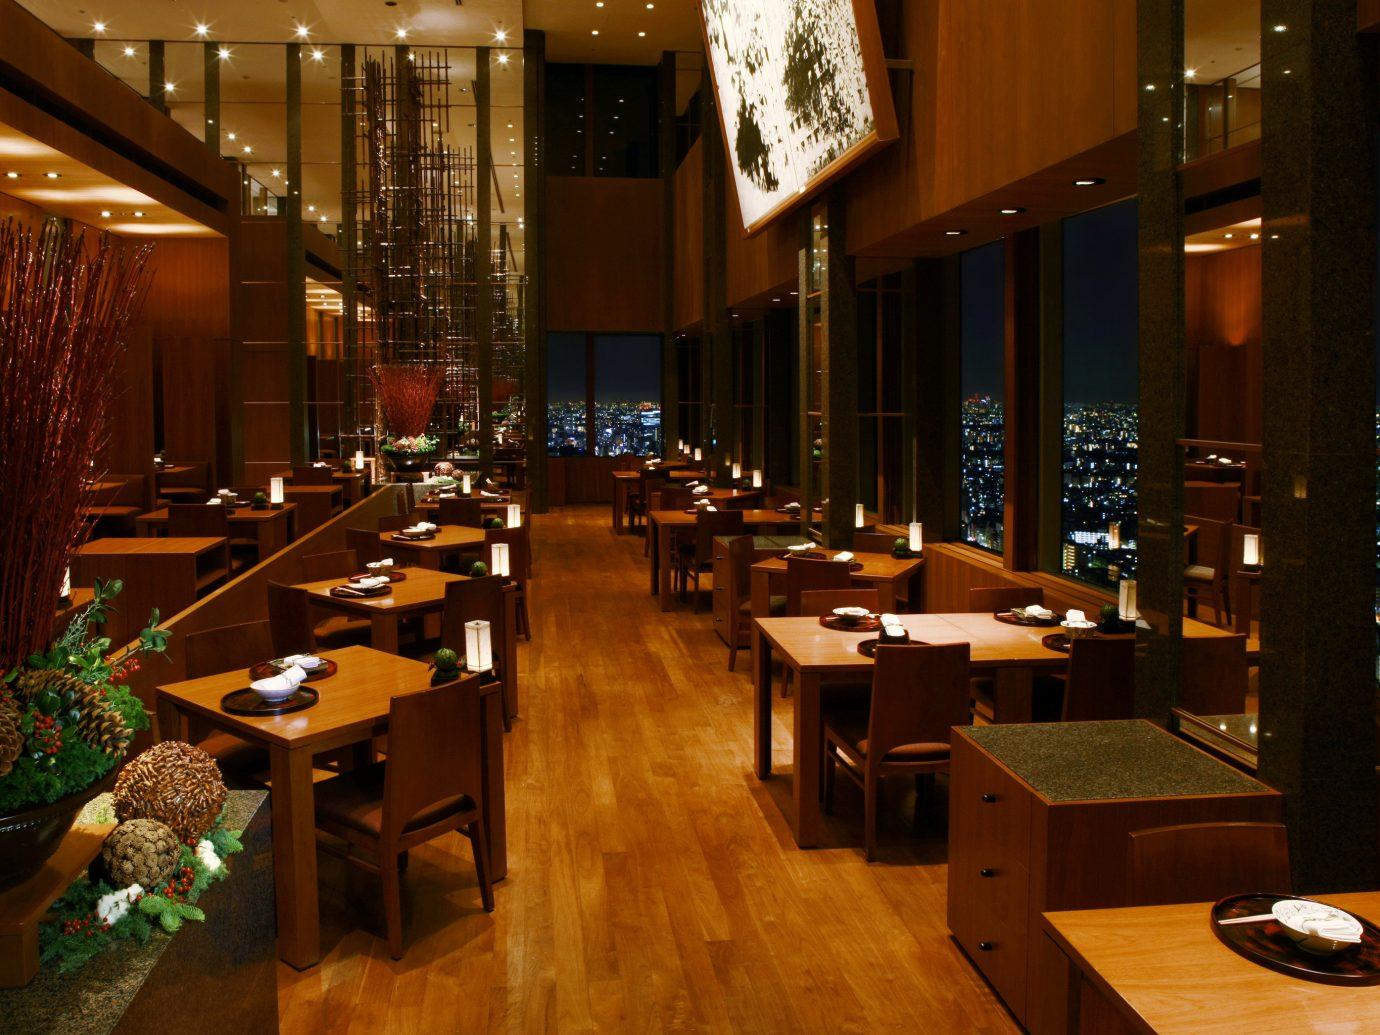 Food + Drink floor indoor room restaurant Lobby meal interior design Bar function hall Design furniture several dining room